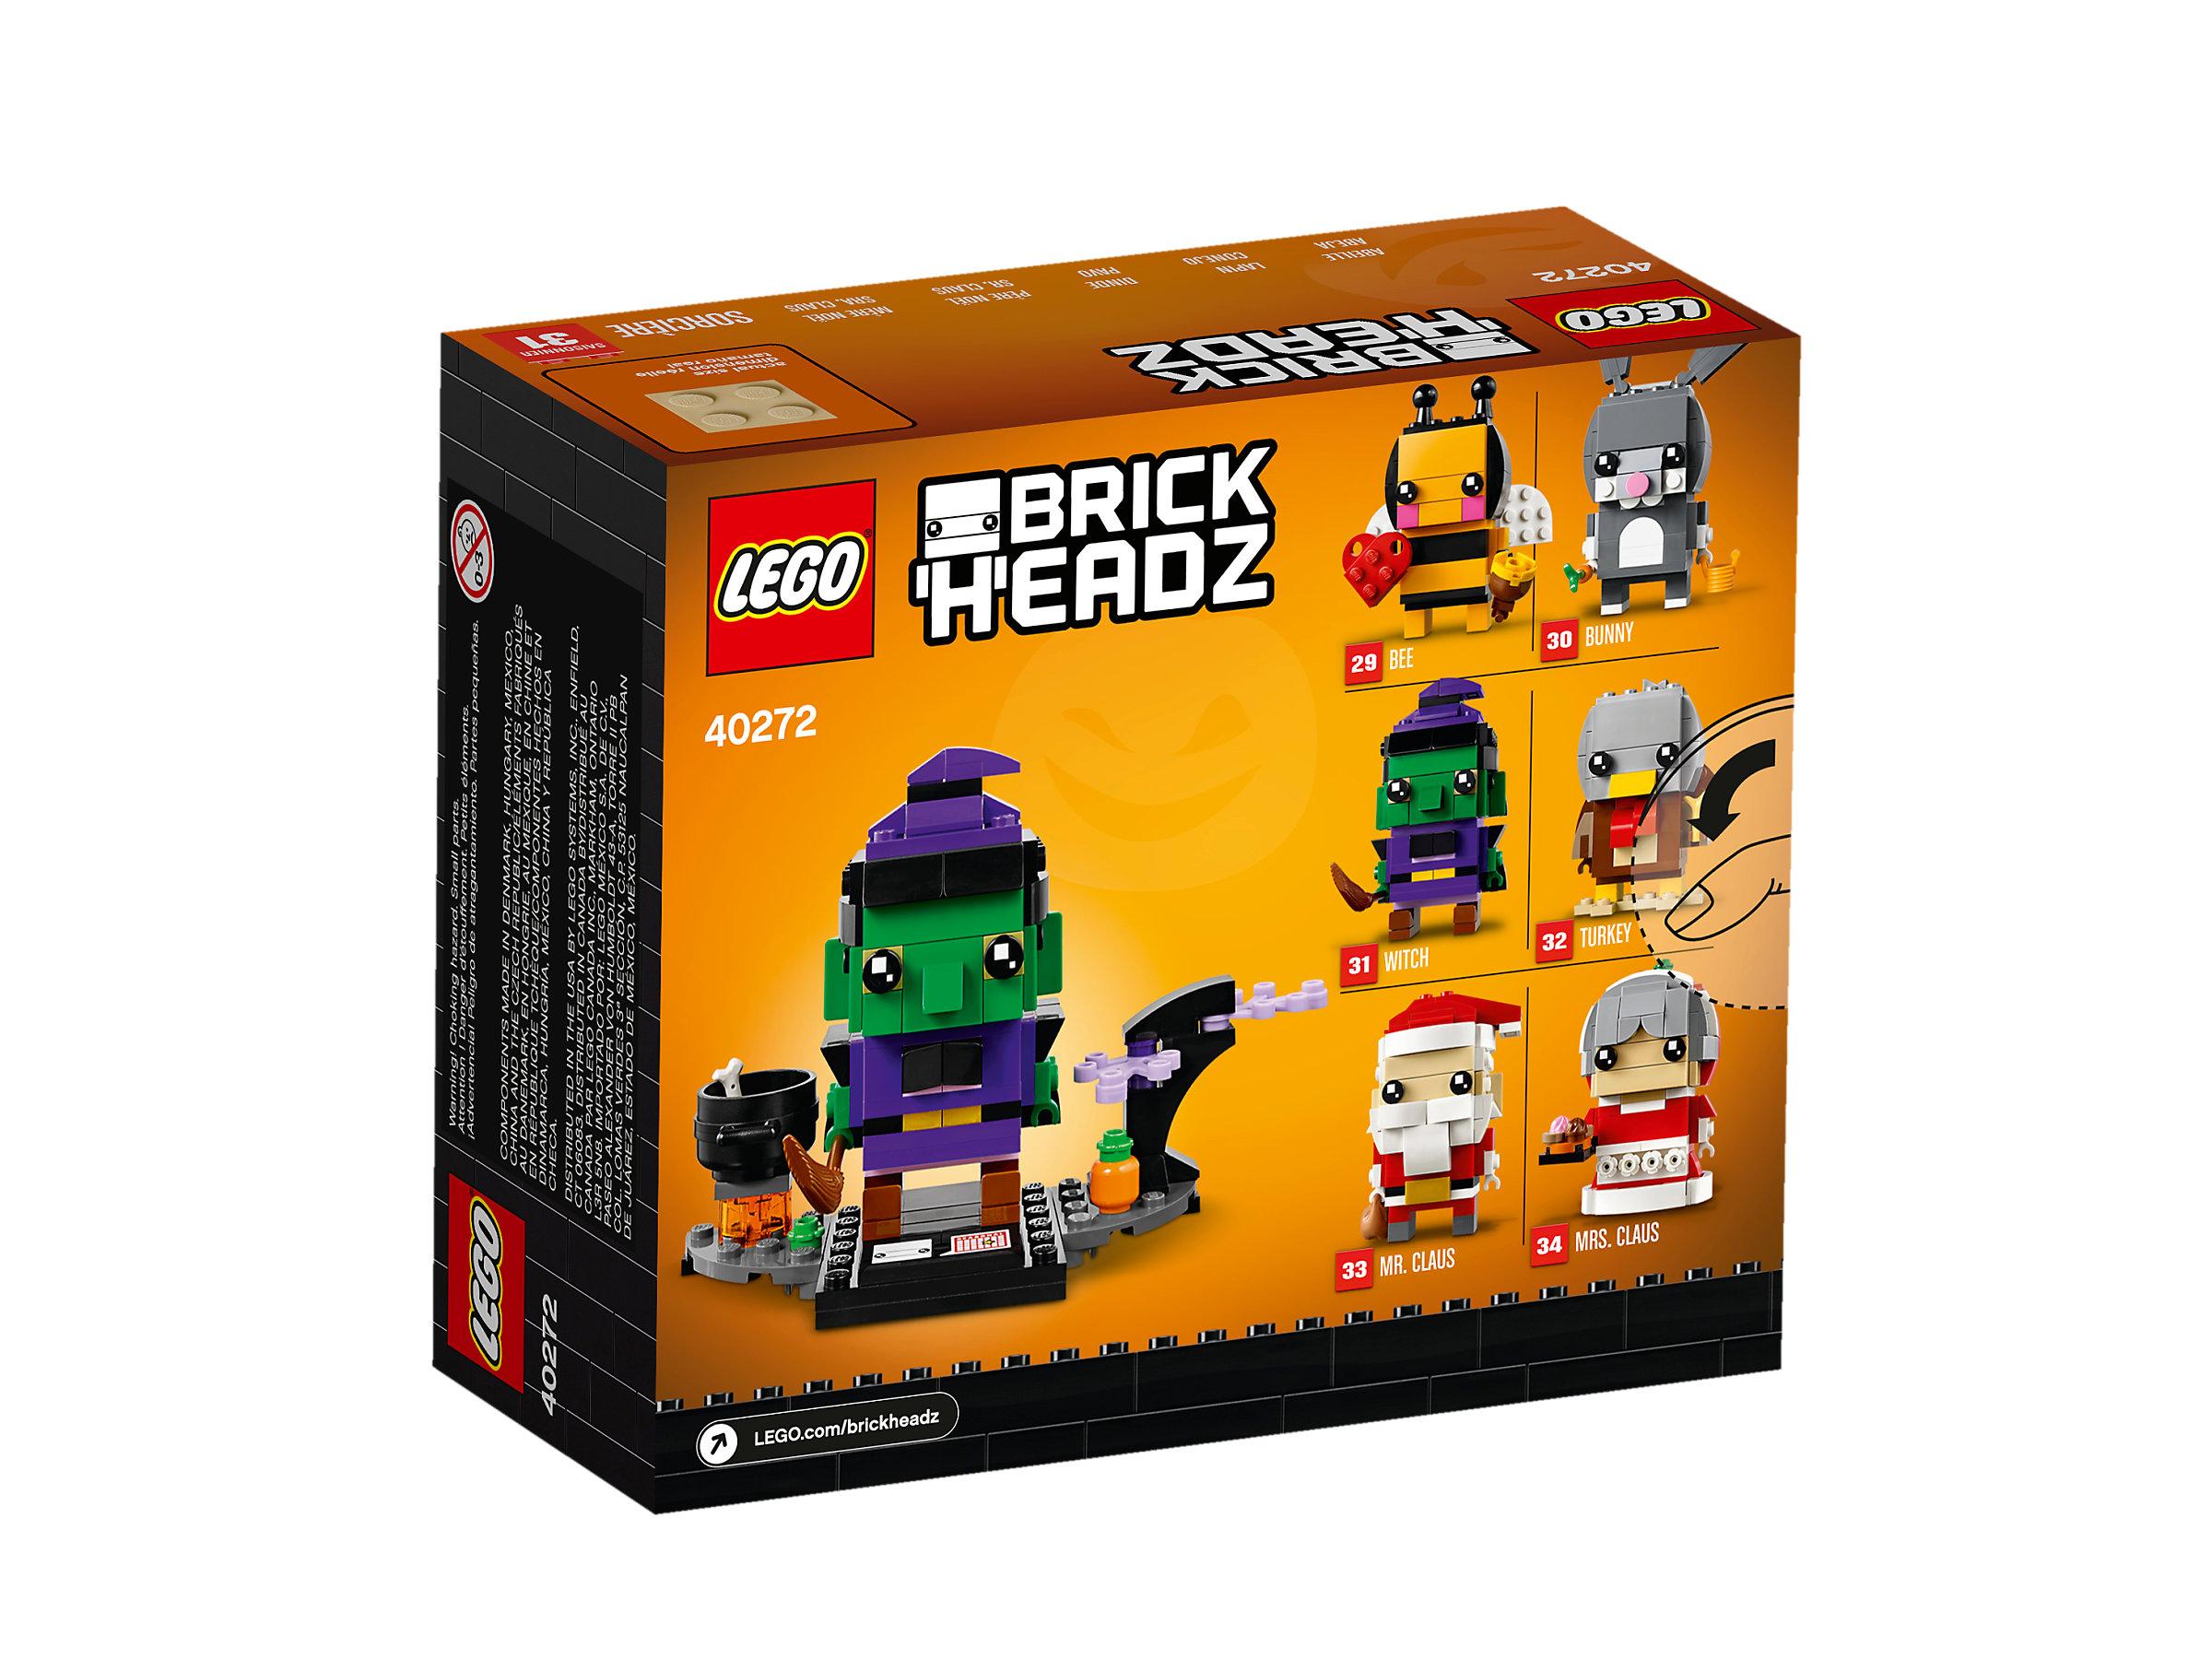 151 Pieces LEGO BrickHeadz Halloween Witch 40272 Building Kit